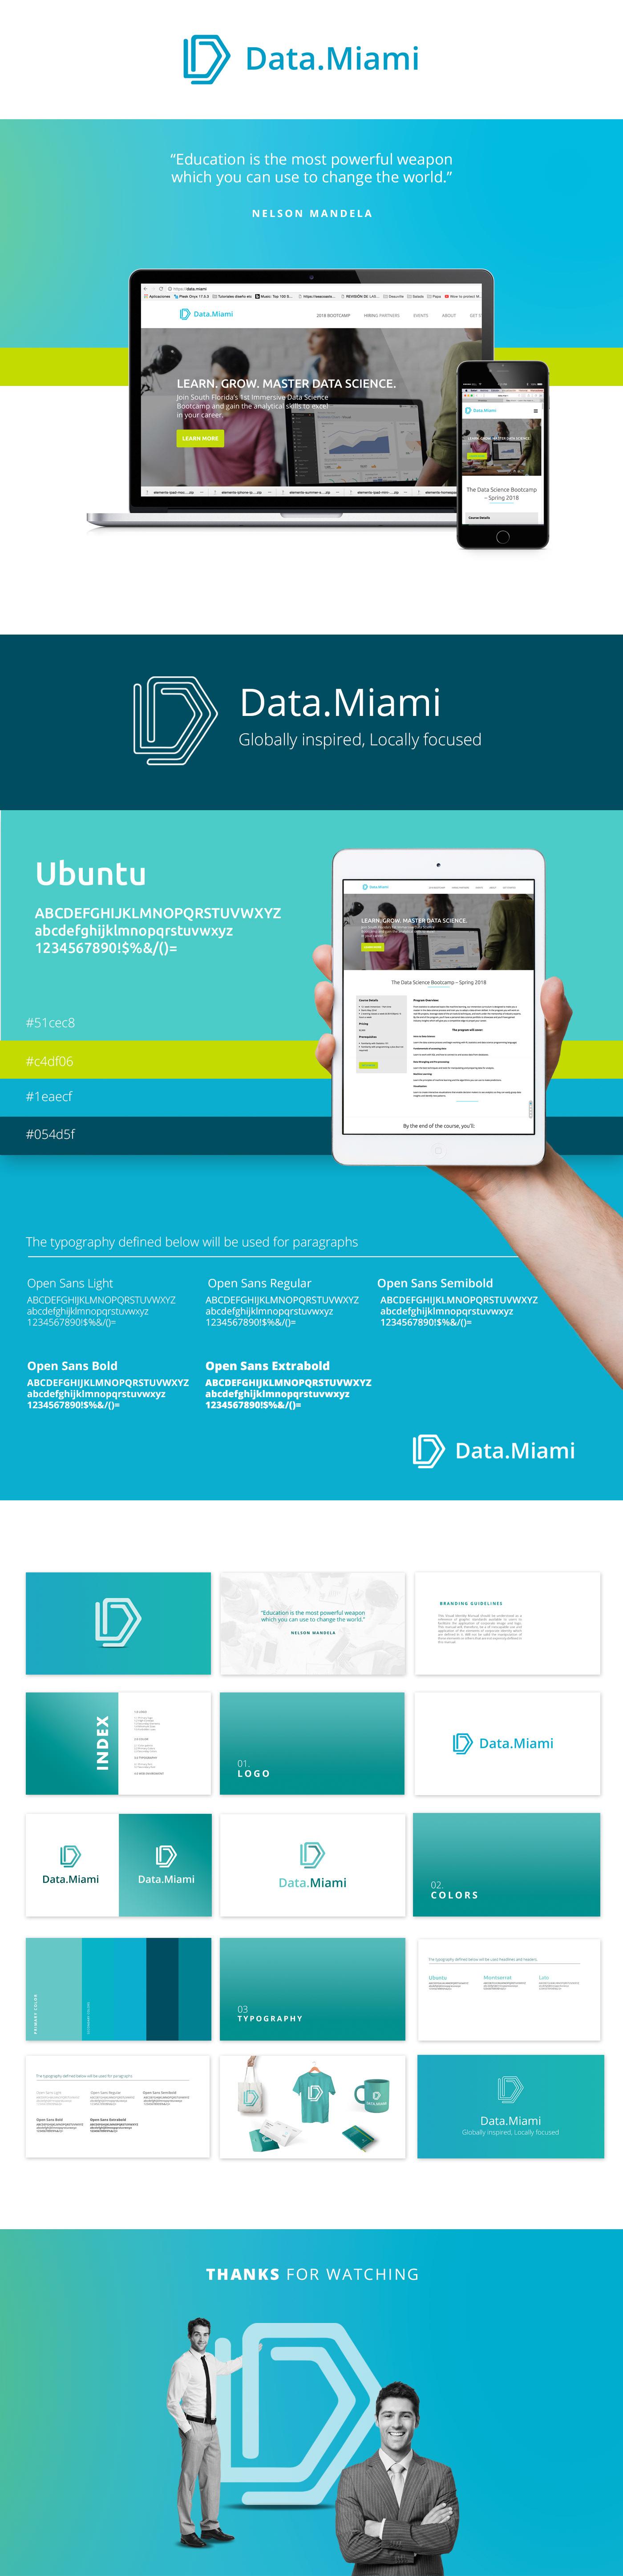 Data.Miami branding